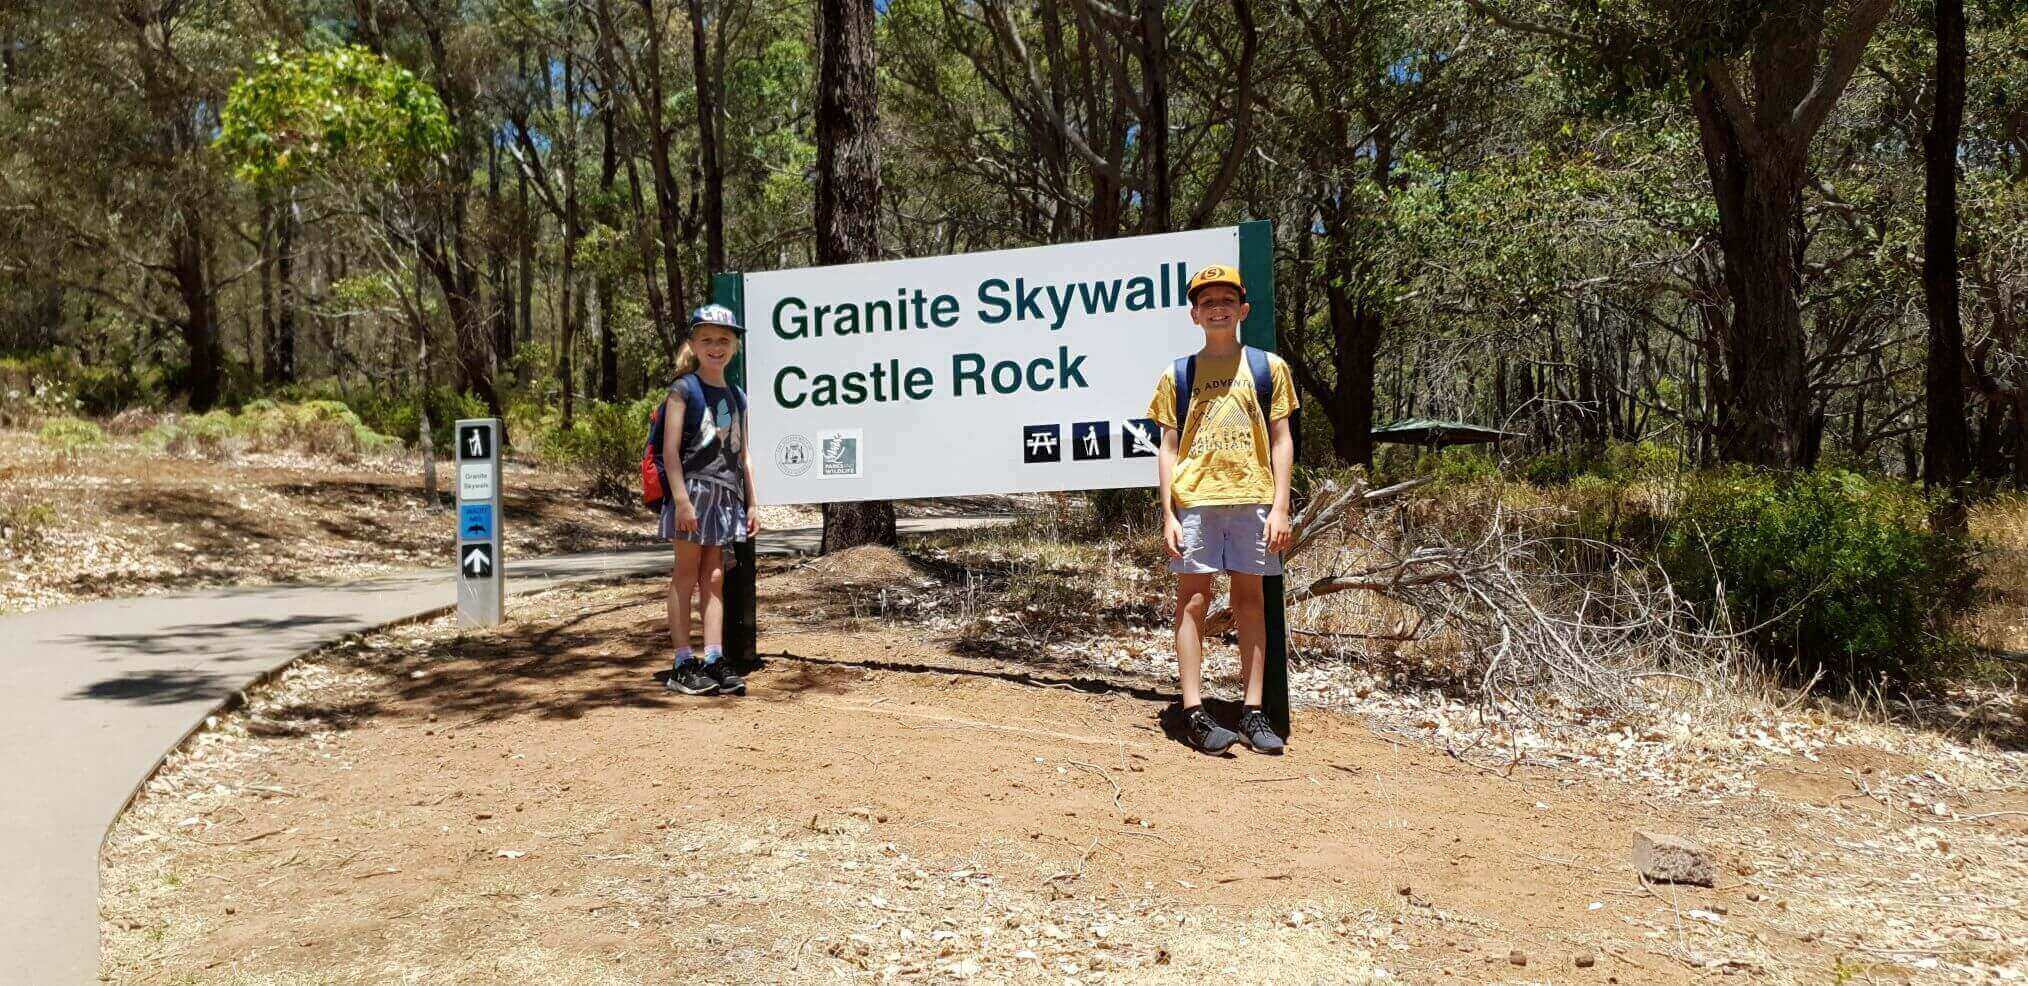 Granite Skywalk, Castle Rock